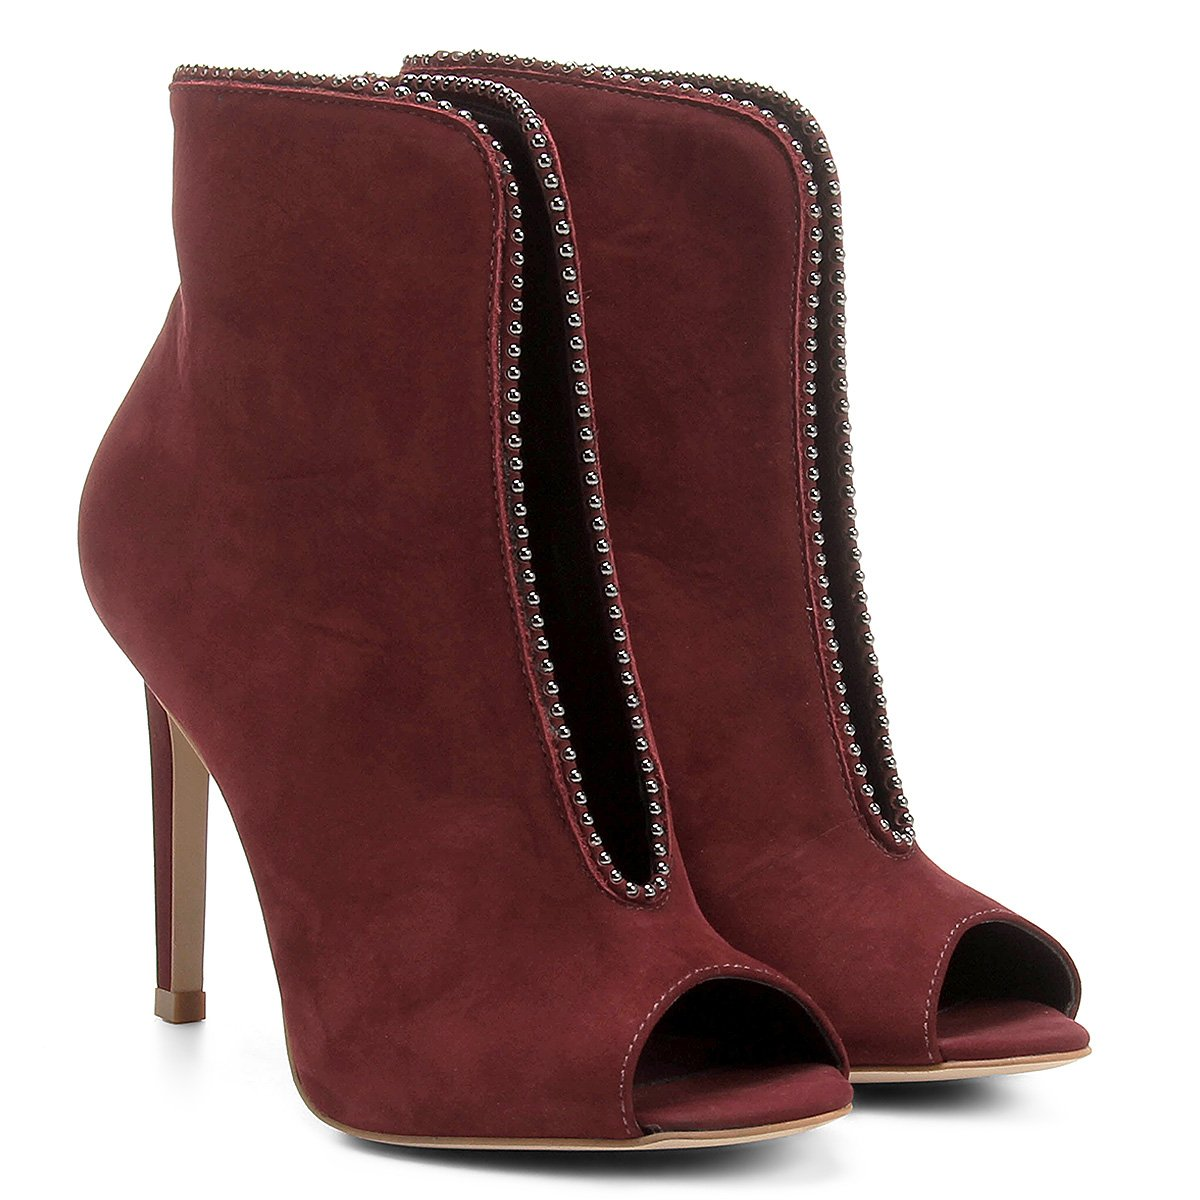 Ankle Vinho Capodarte Feminina Couro Boot Ankle Boot Tachas f0Rrfqx